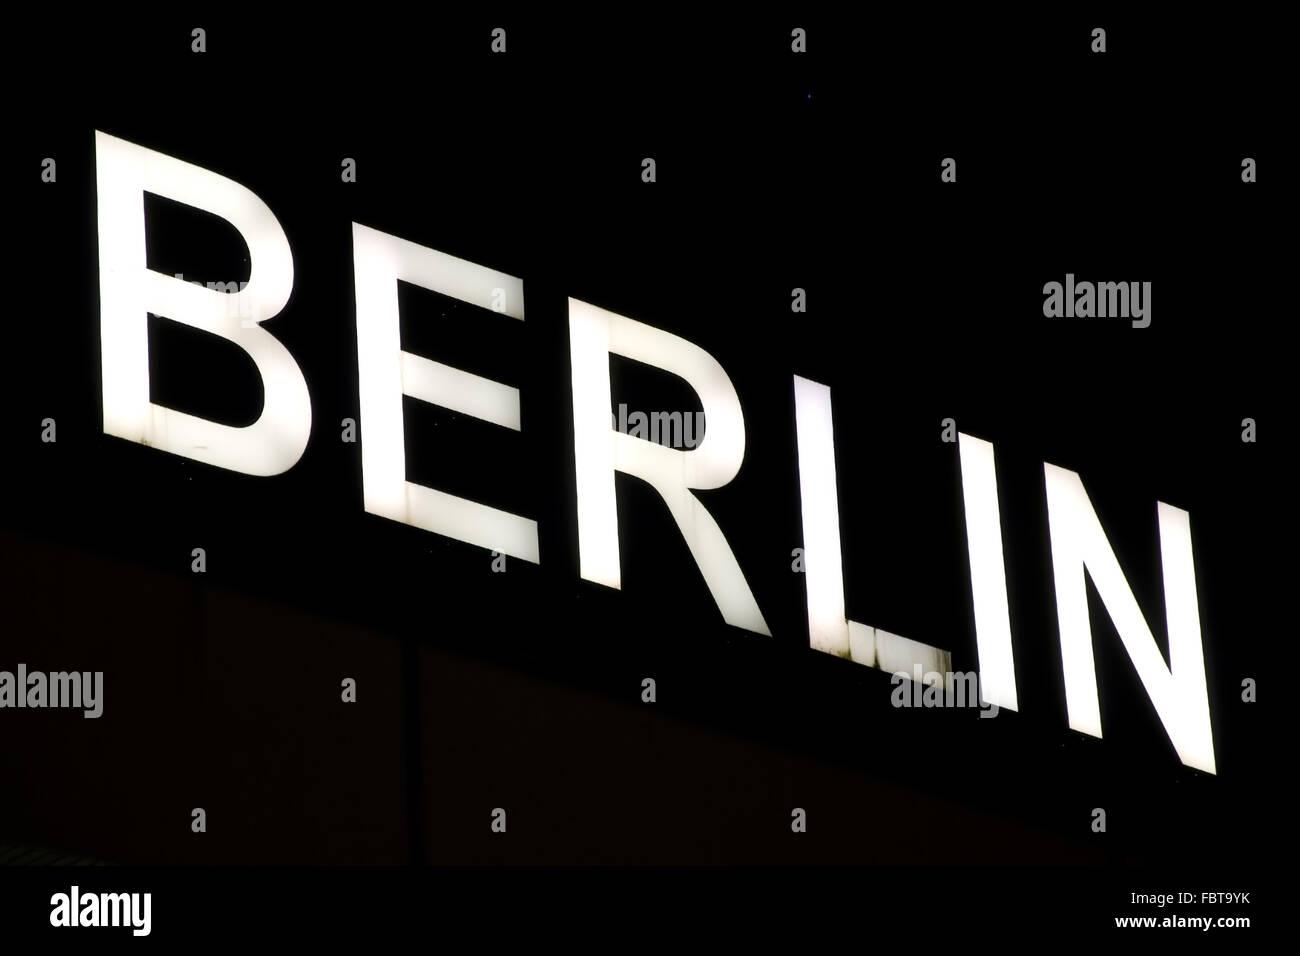 berlin illuminated letters - Stock Image